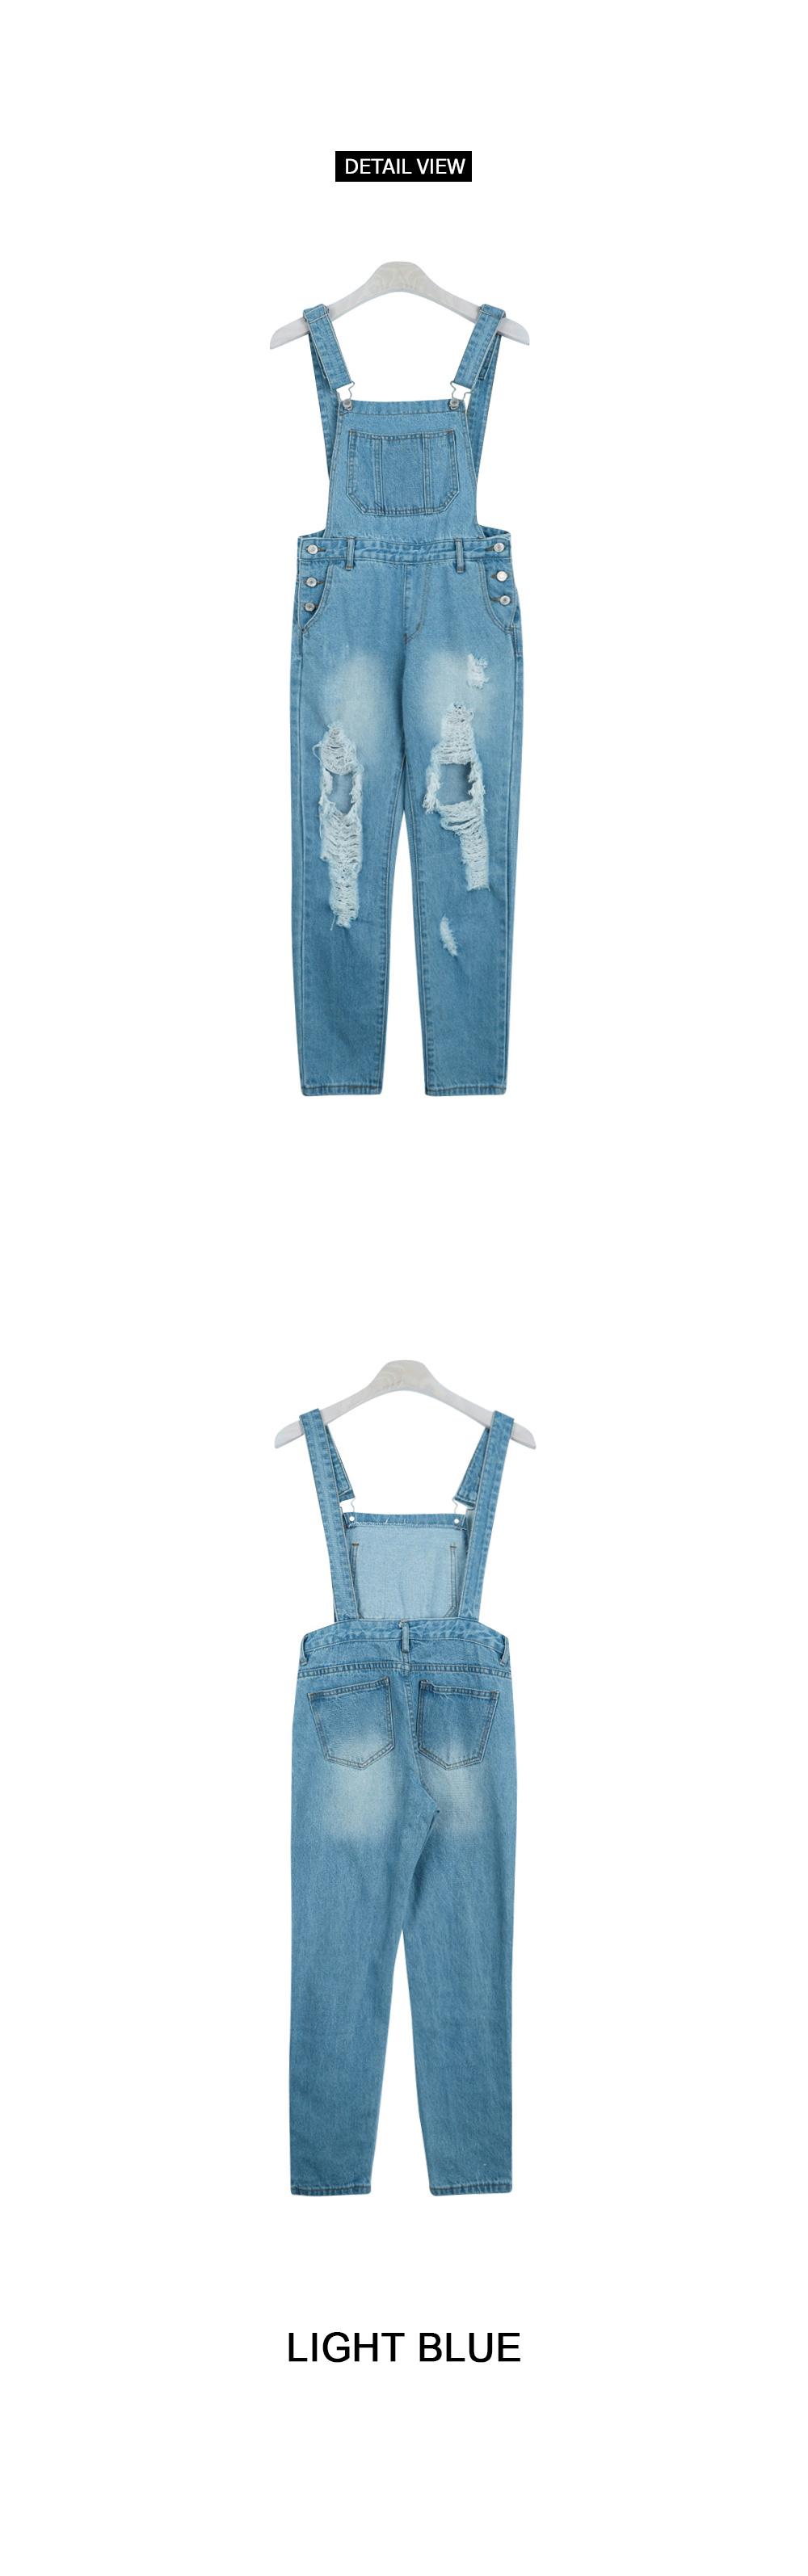 Vintage denim overall pants